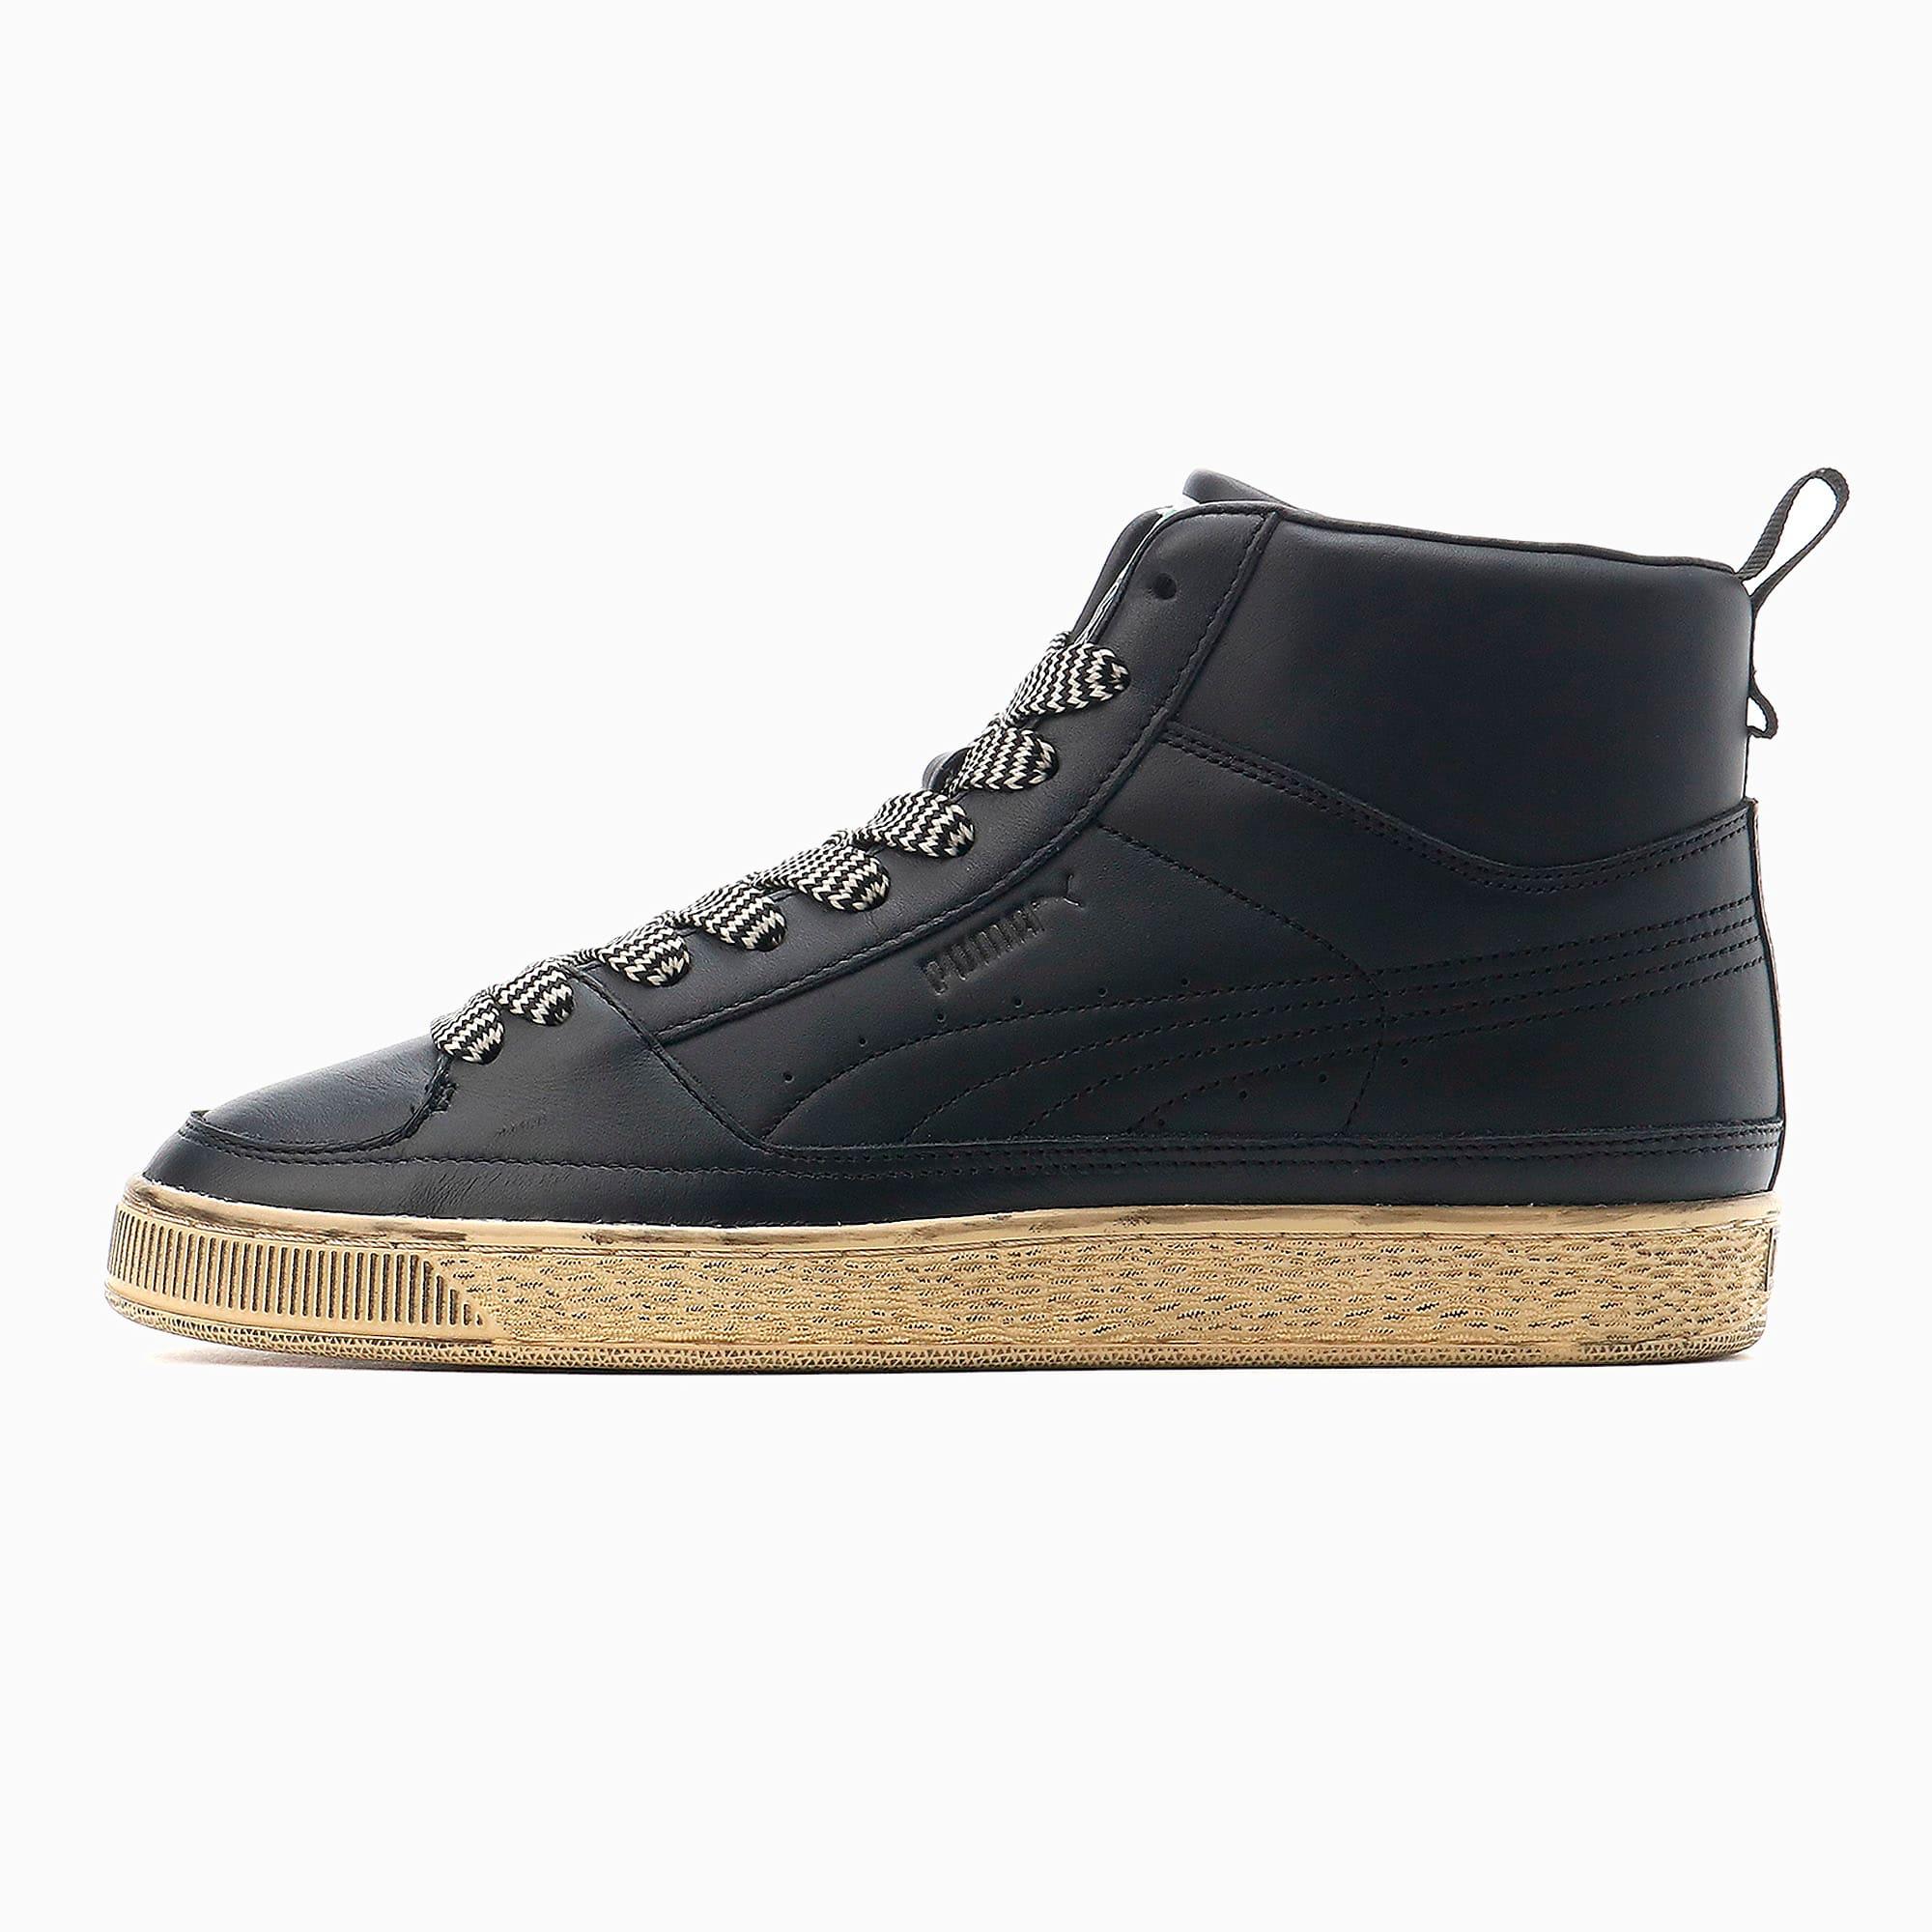 PUMA x RHUIGI Suede Mid Sneakers